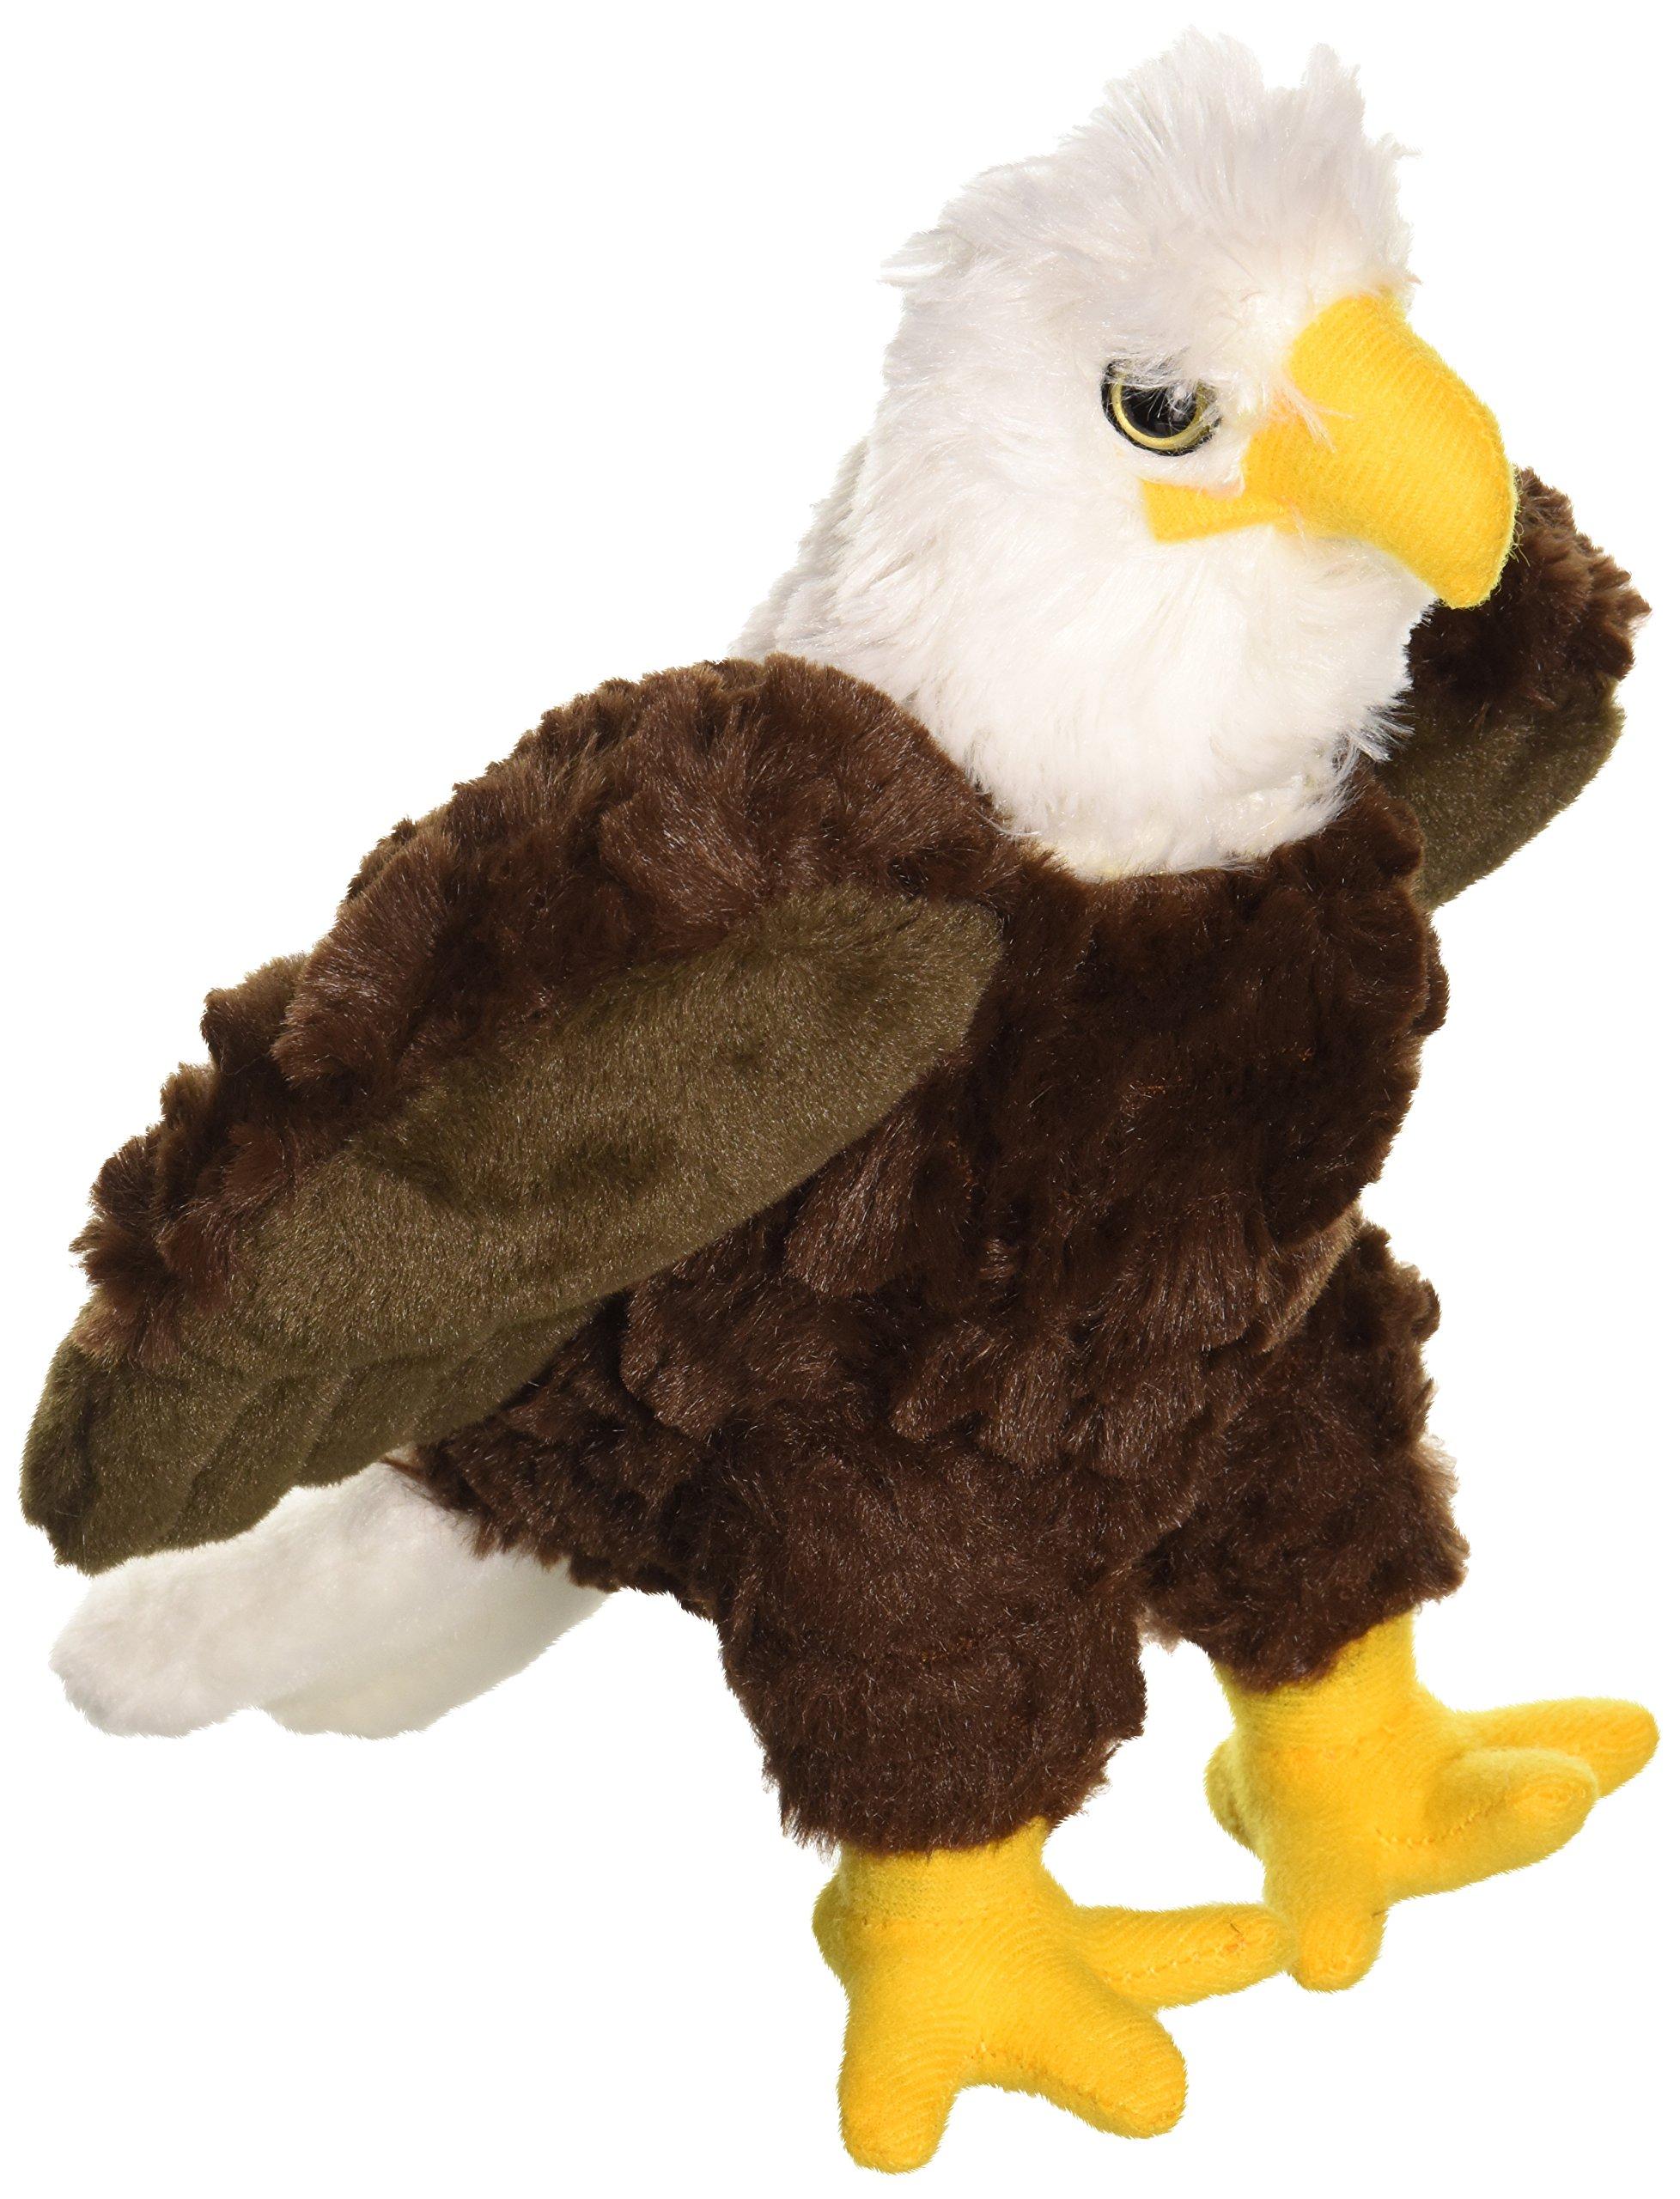 Wild Republic Bald Eagle Plush, Stuffed Animal, Plush Toy, Gifts for Kids, Cuddlekins 8 Inches